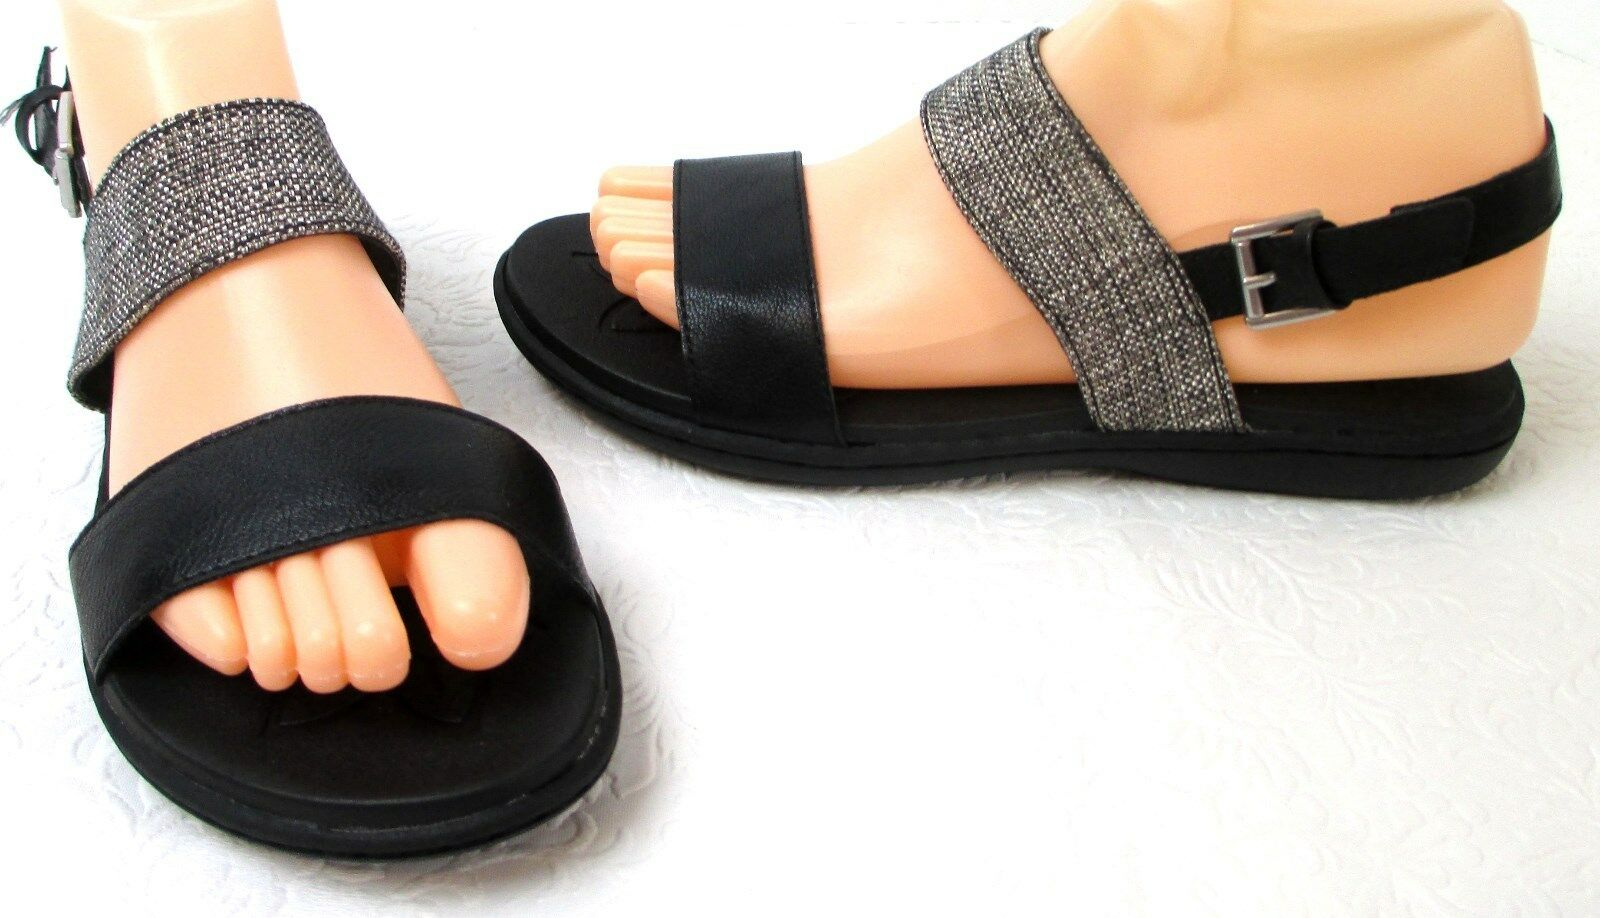 Women's B.O.C. Boyle Z10209 Black Weave Fabric Strappy Fashion Sandals